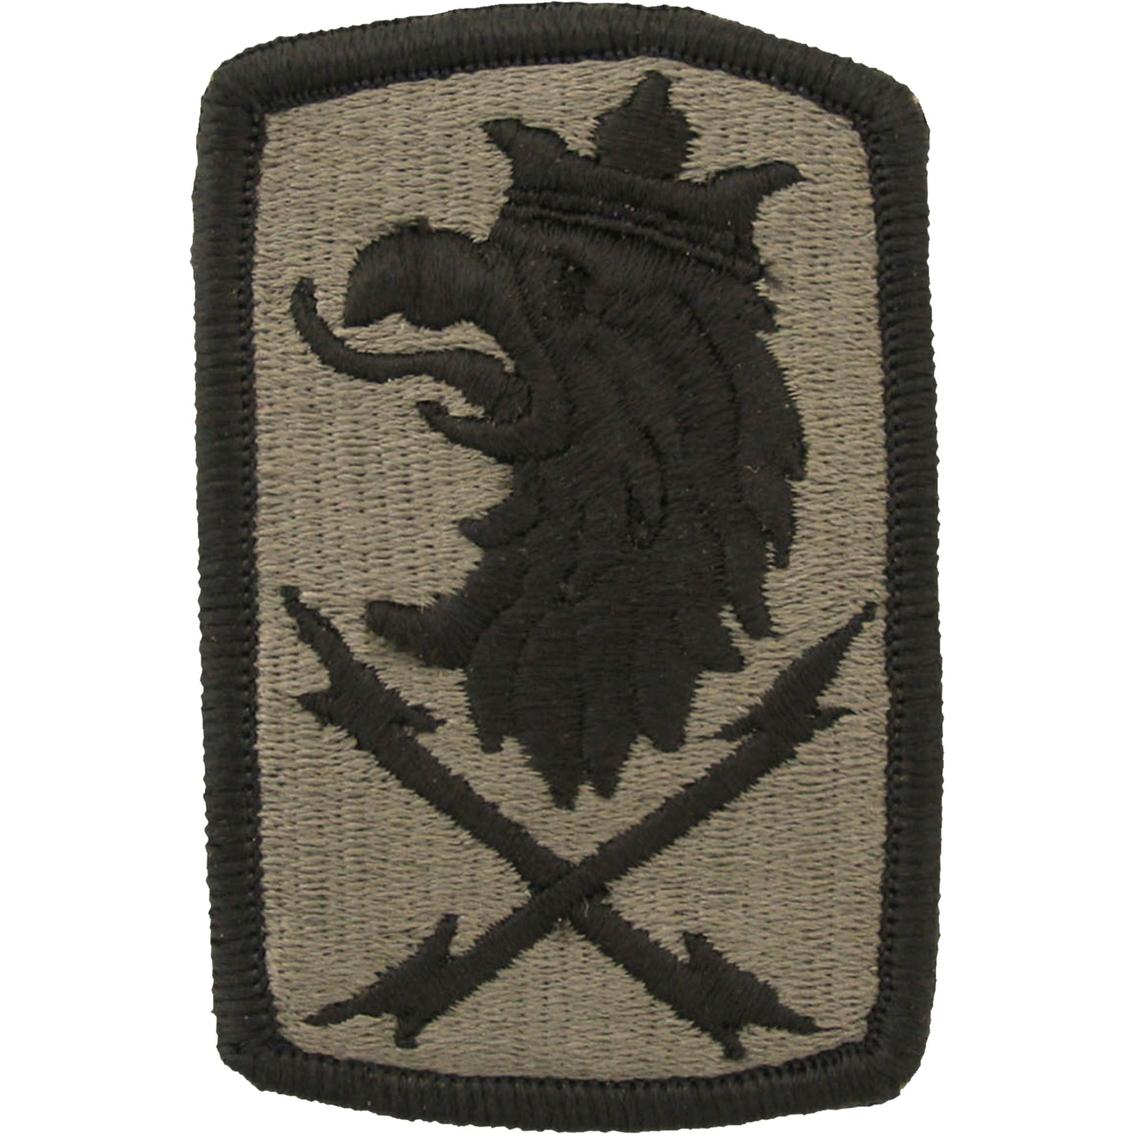 Army Unit Patch 22nd Signal Brigade (ocp)